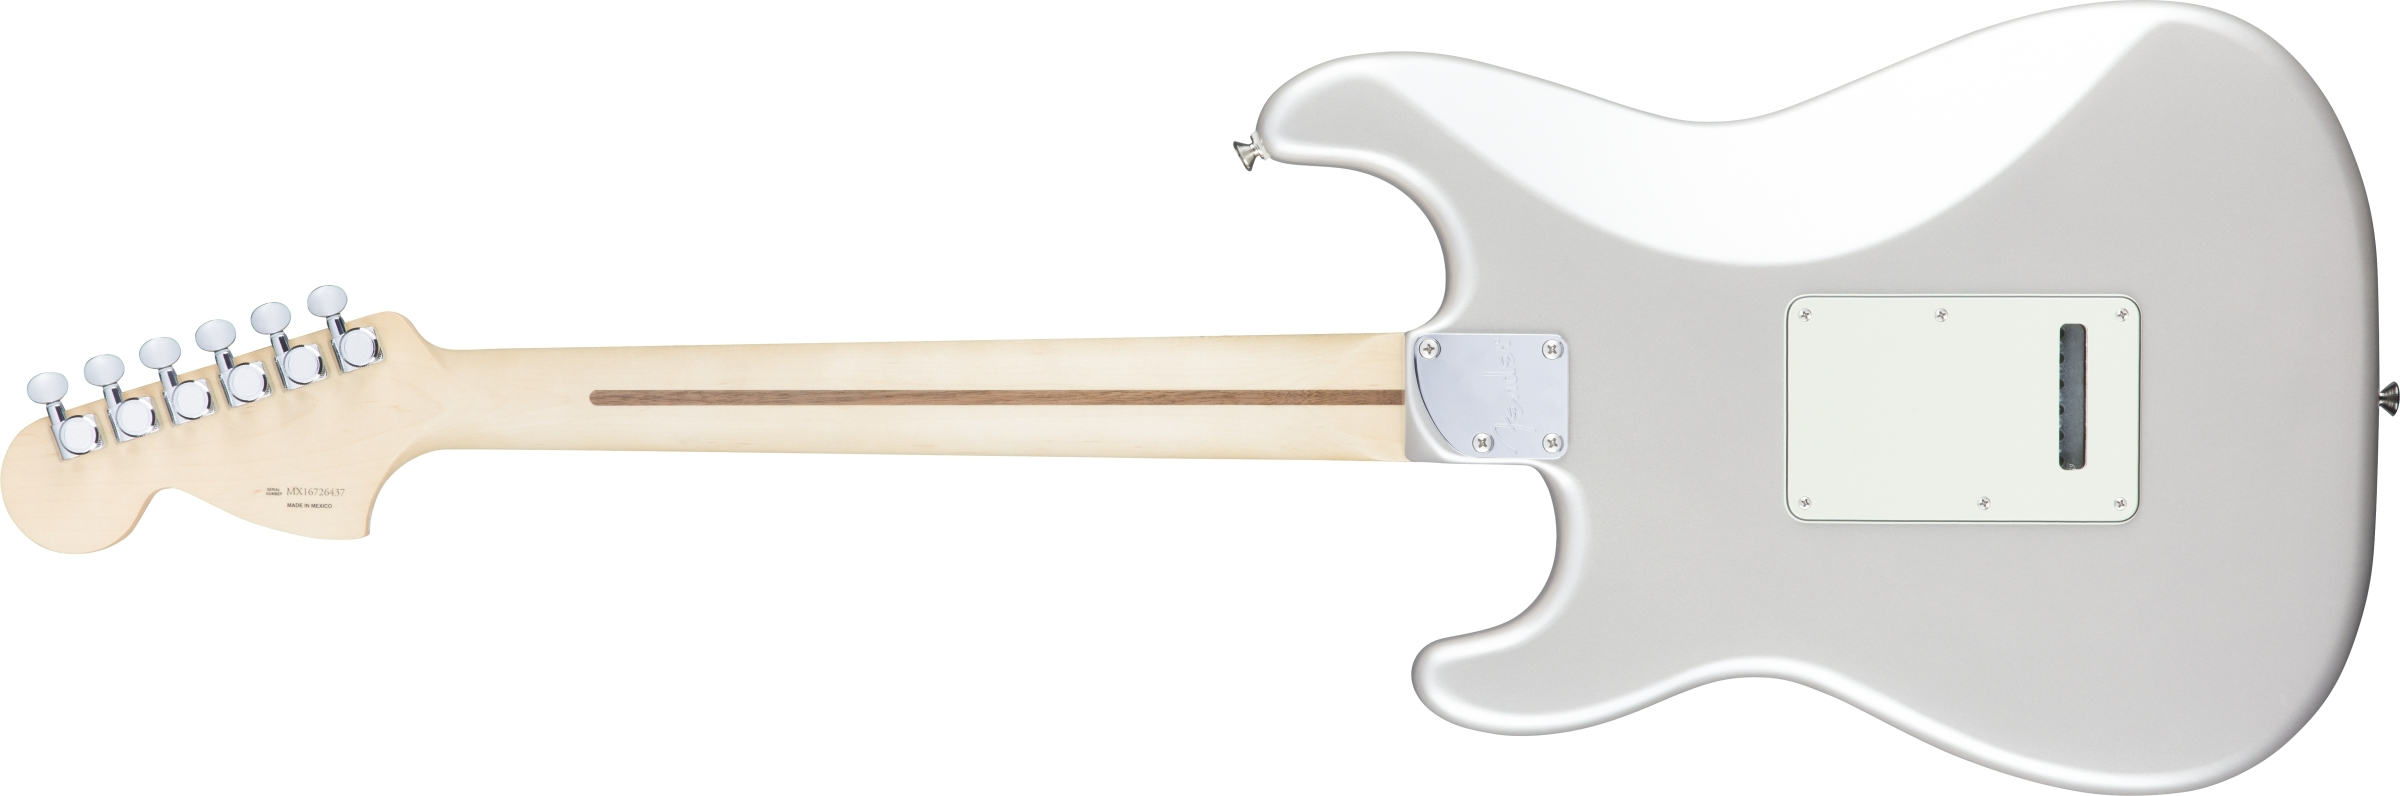 Fender Lonestar Strat Wiring Diagram Posts Mim Deluxe Lone Star Stratocaster Auto The Black